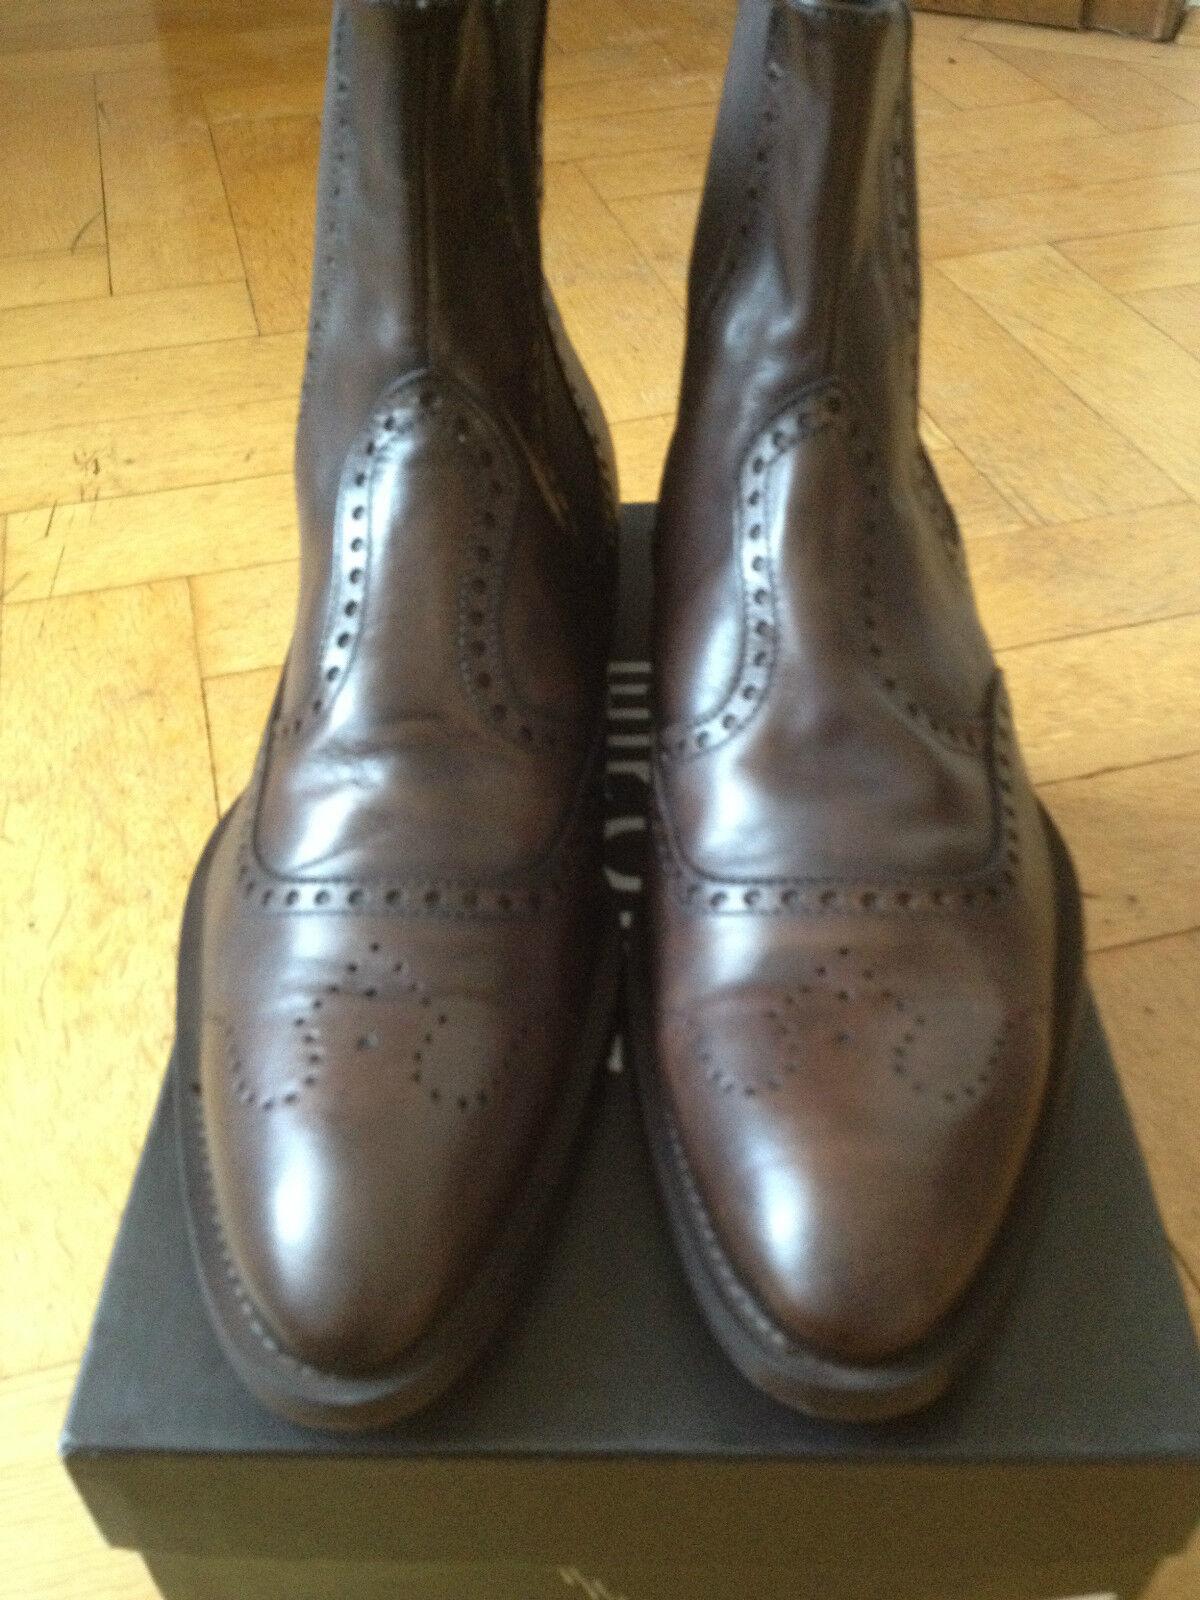 BROS des Chelsea Bottines bottes Bottine cuir marron us 11.5 eur 45 UK 10.5